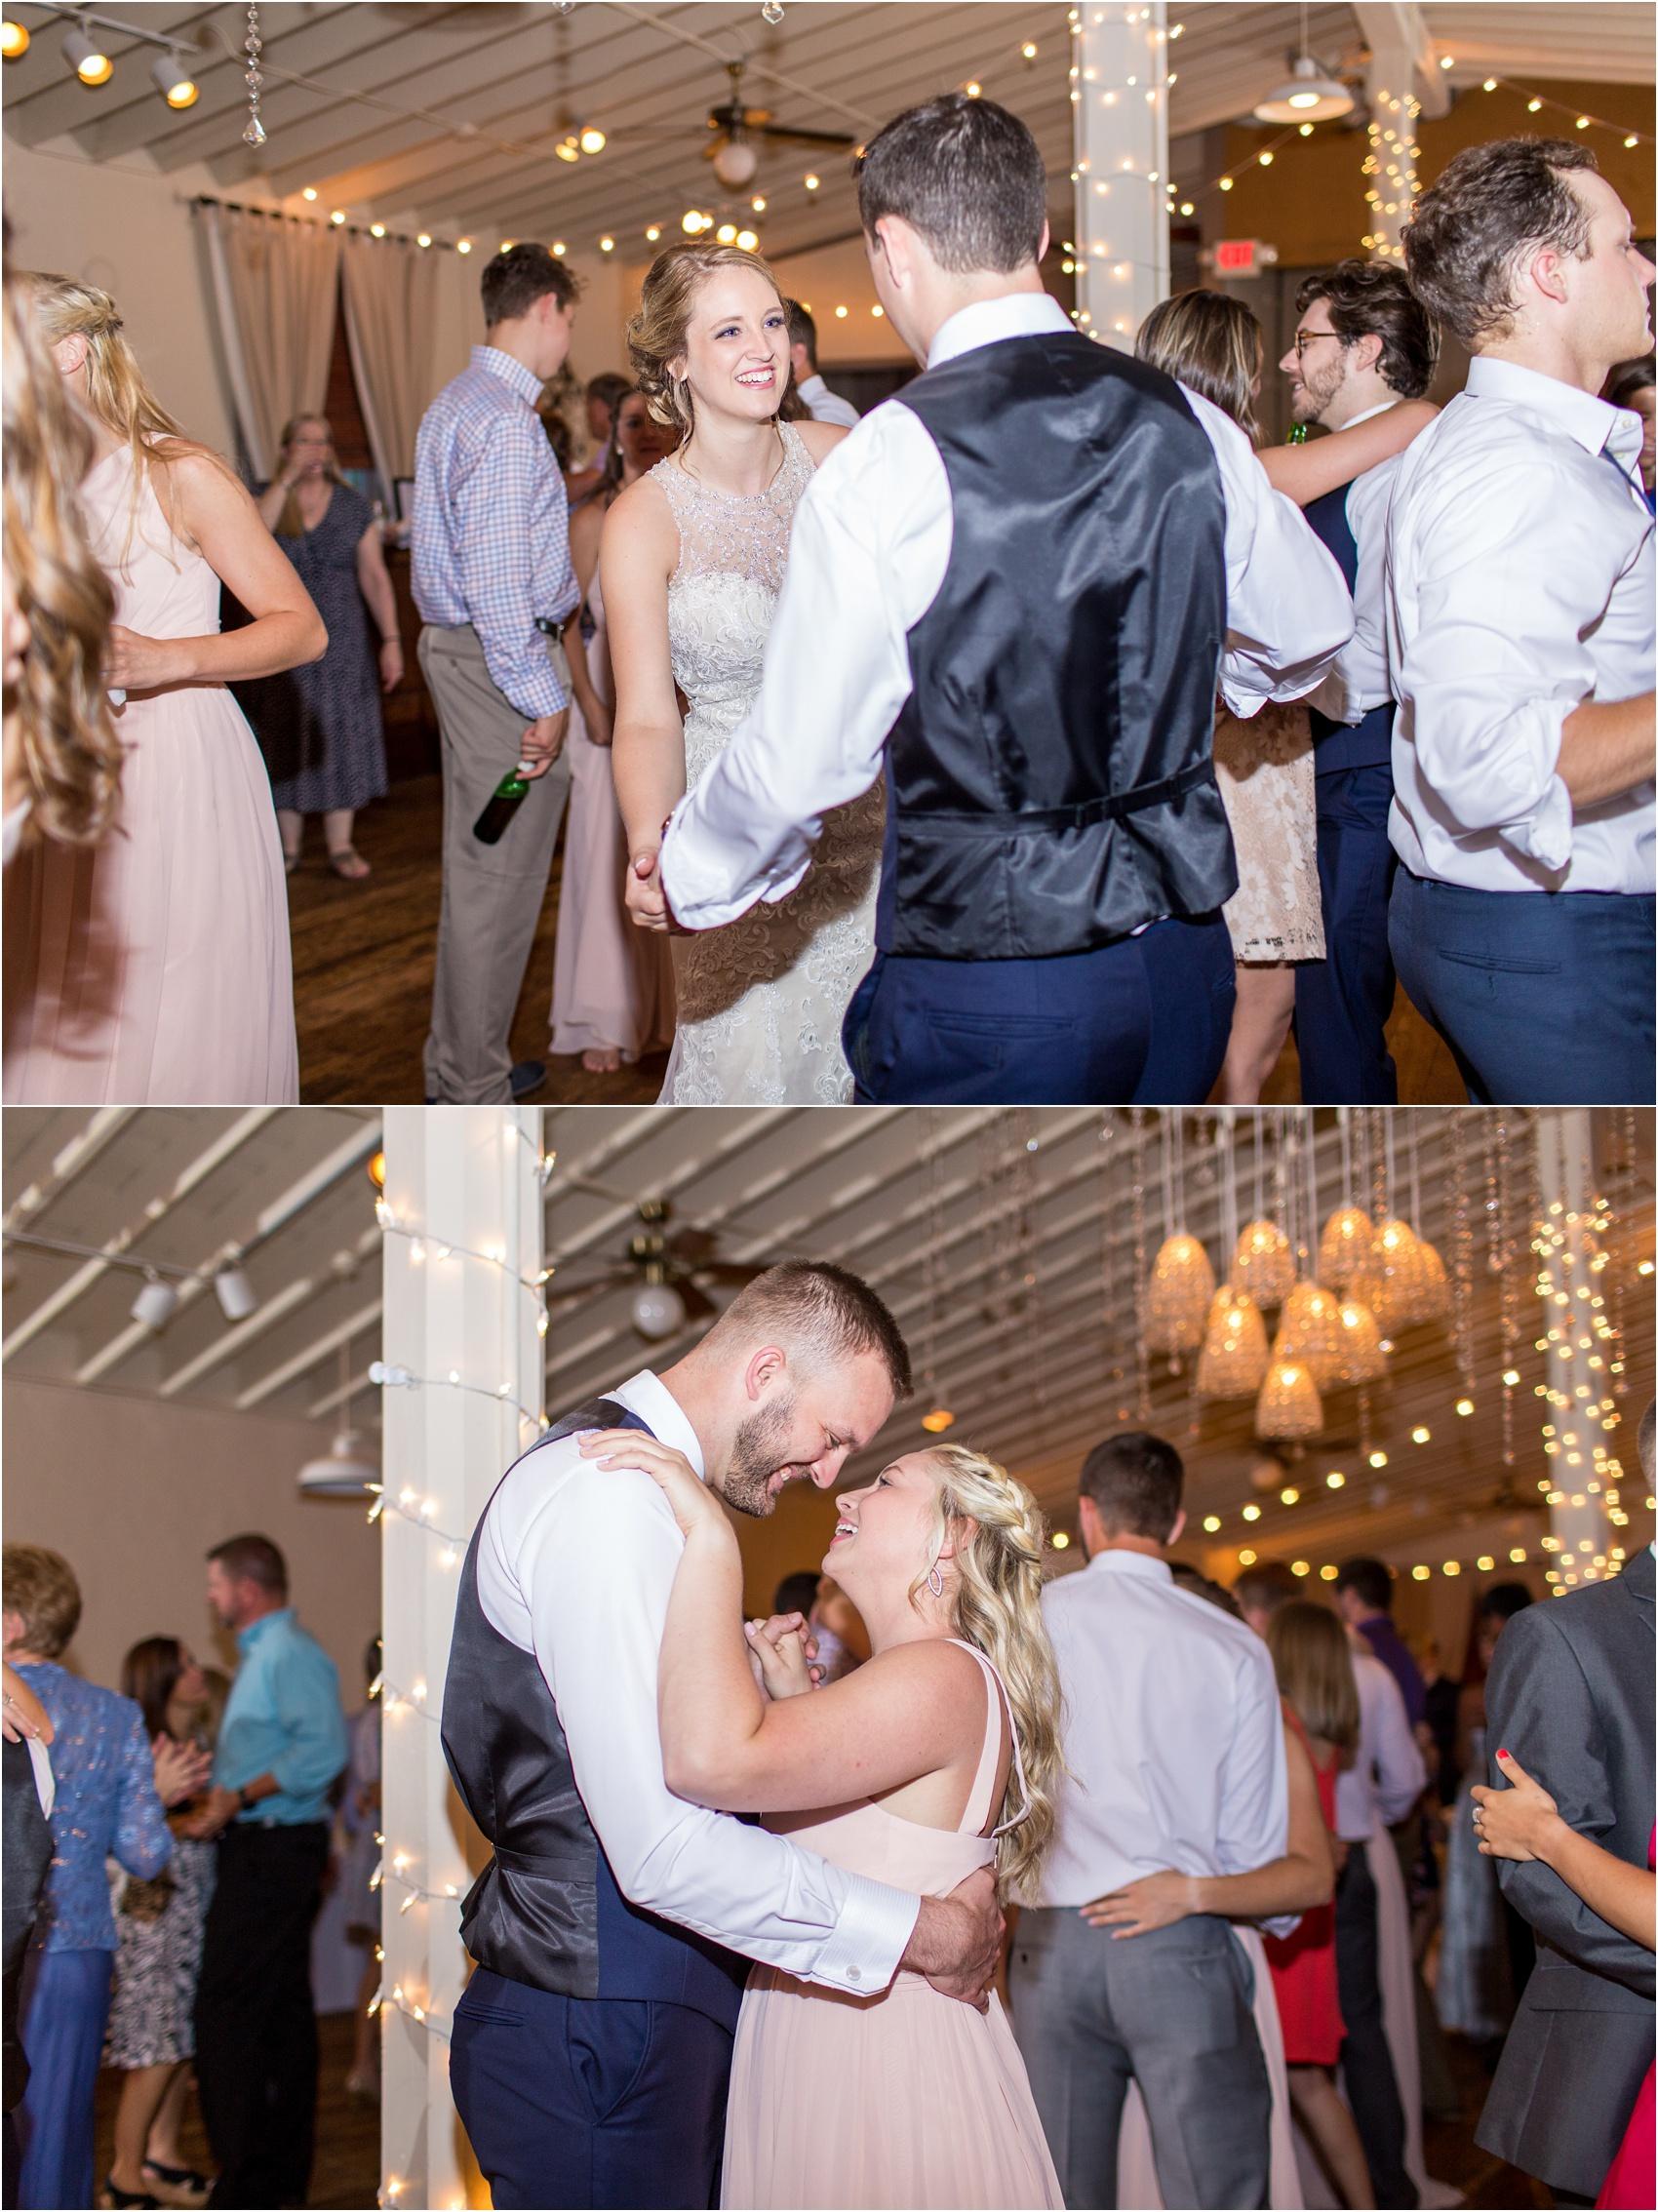 Savannah Eve Photography- Roper-Powell Wedding- Blog-75.jpg